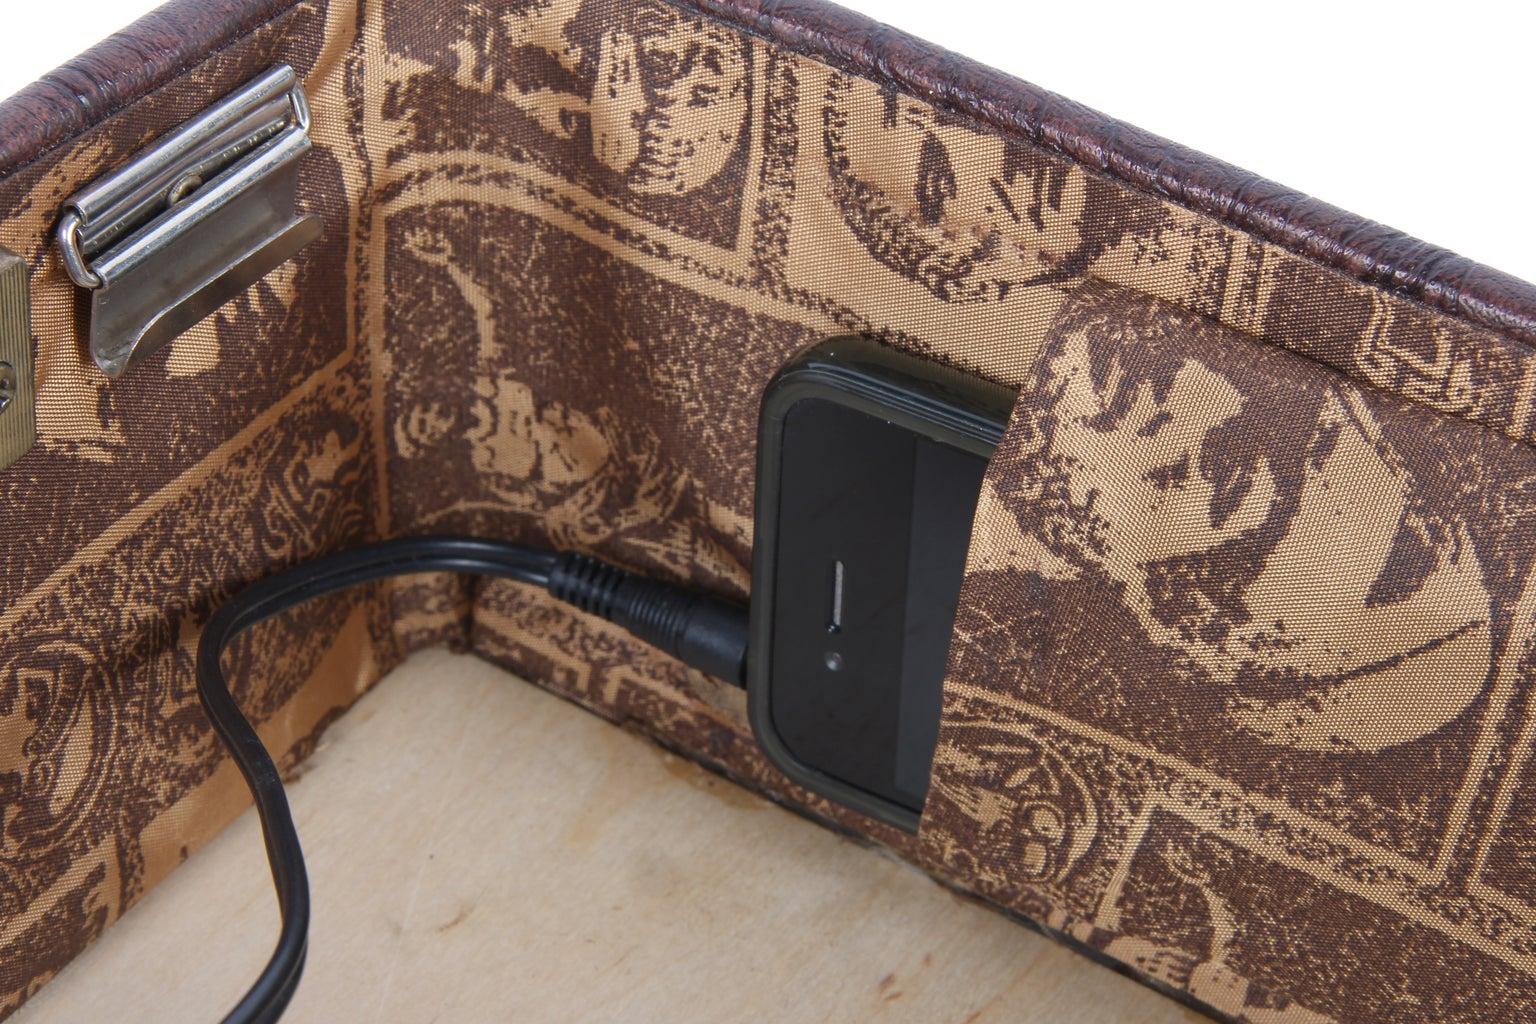 Create IPod/phone Mount on Inside of Suitcase